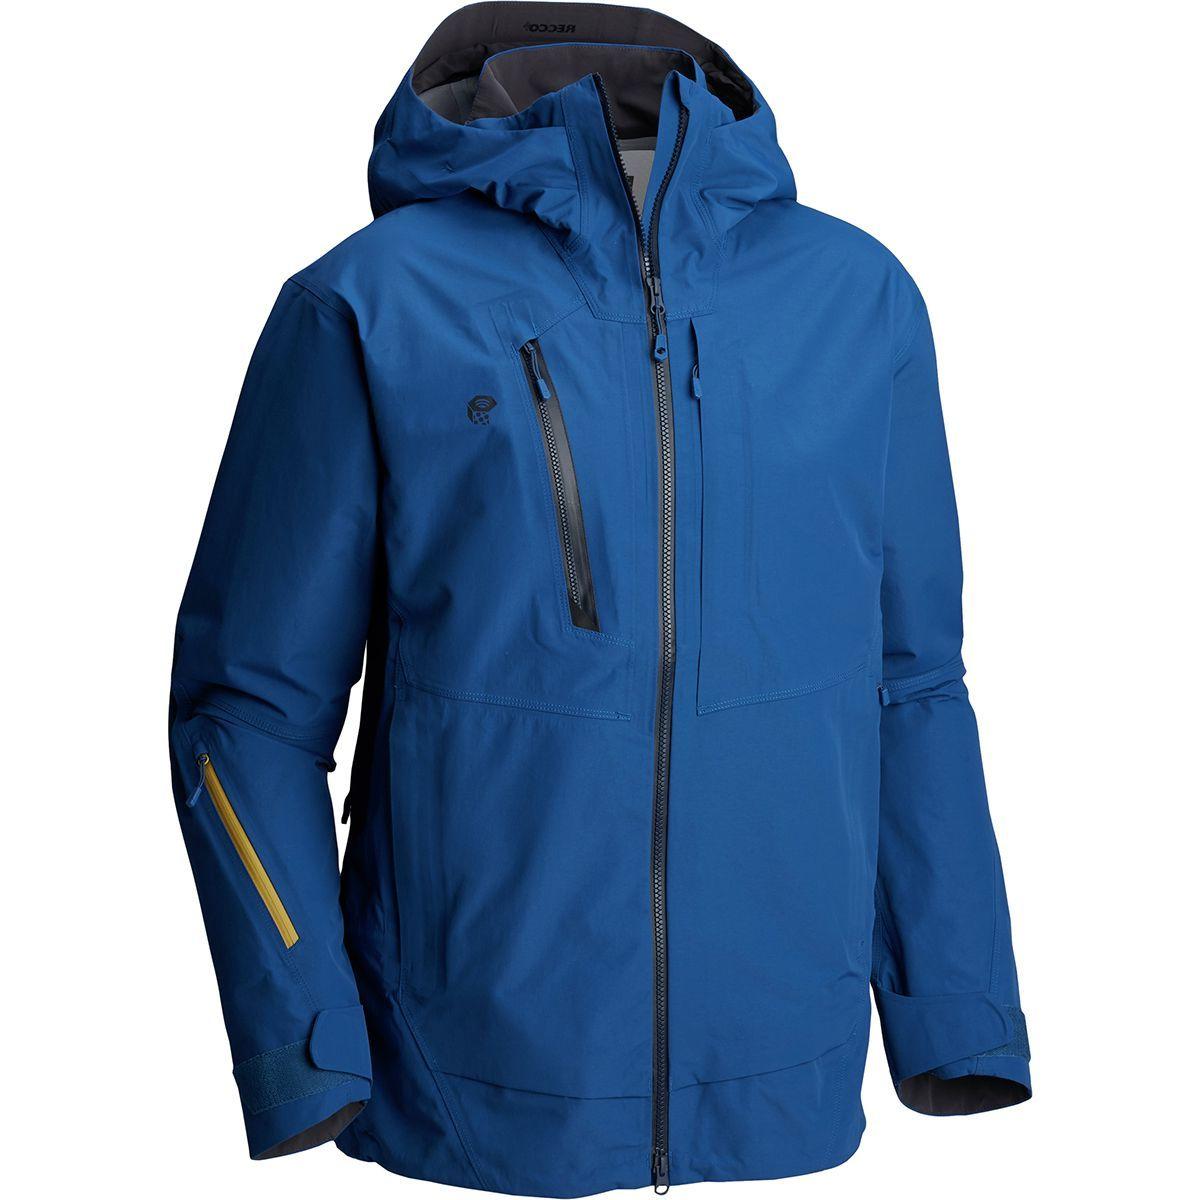 Mountain Hardwear Boundary Line Jacket - Men's